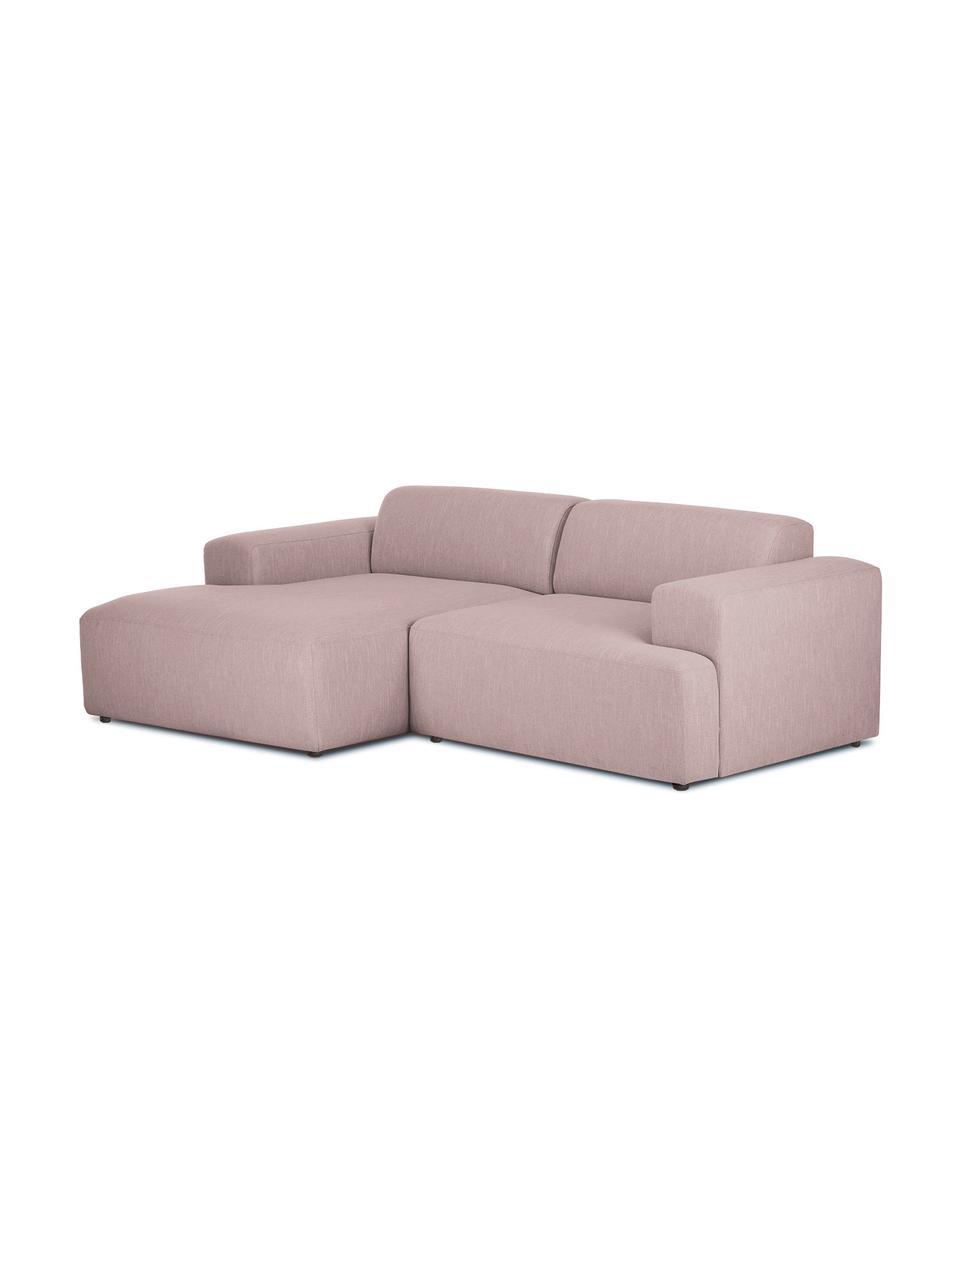 Hoekbank Melva (3-zits) in roze, Bekleding: 100% polyester, Frame: massief grenenhout, FSC-g, Poten: kunststof, Geweven stof roze, B 239 x D 143 cm